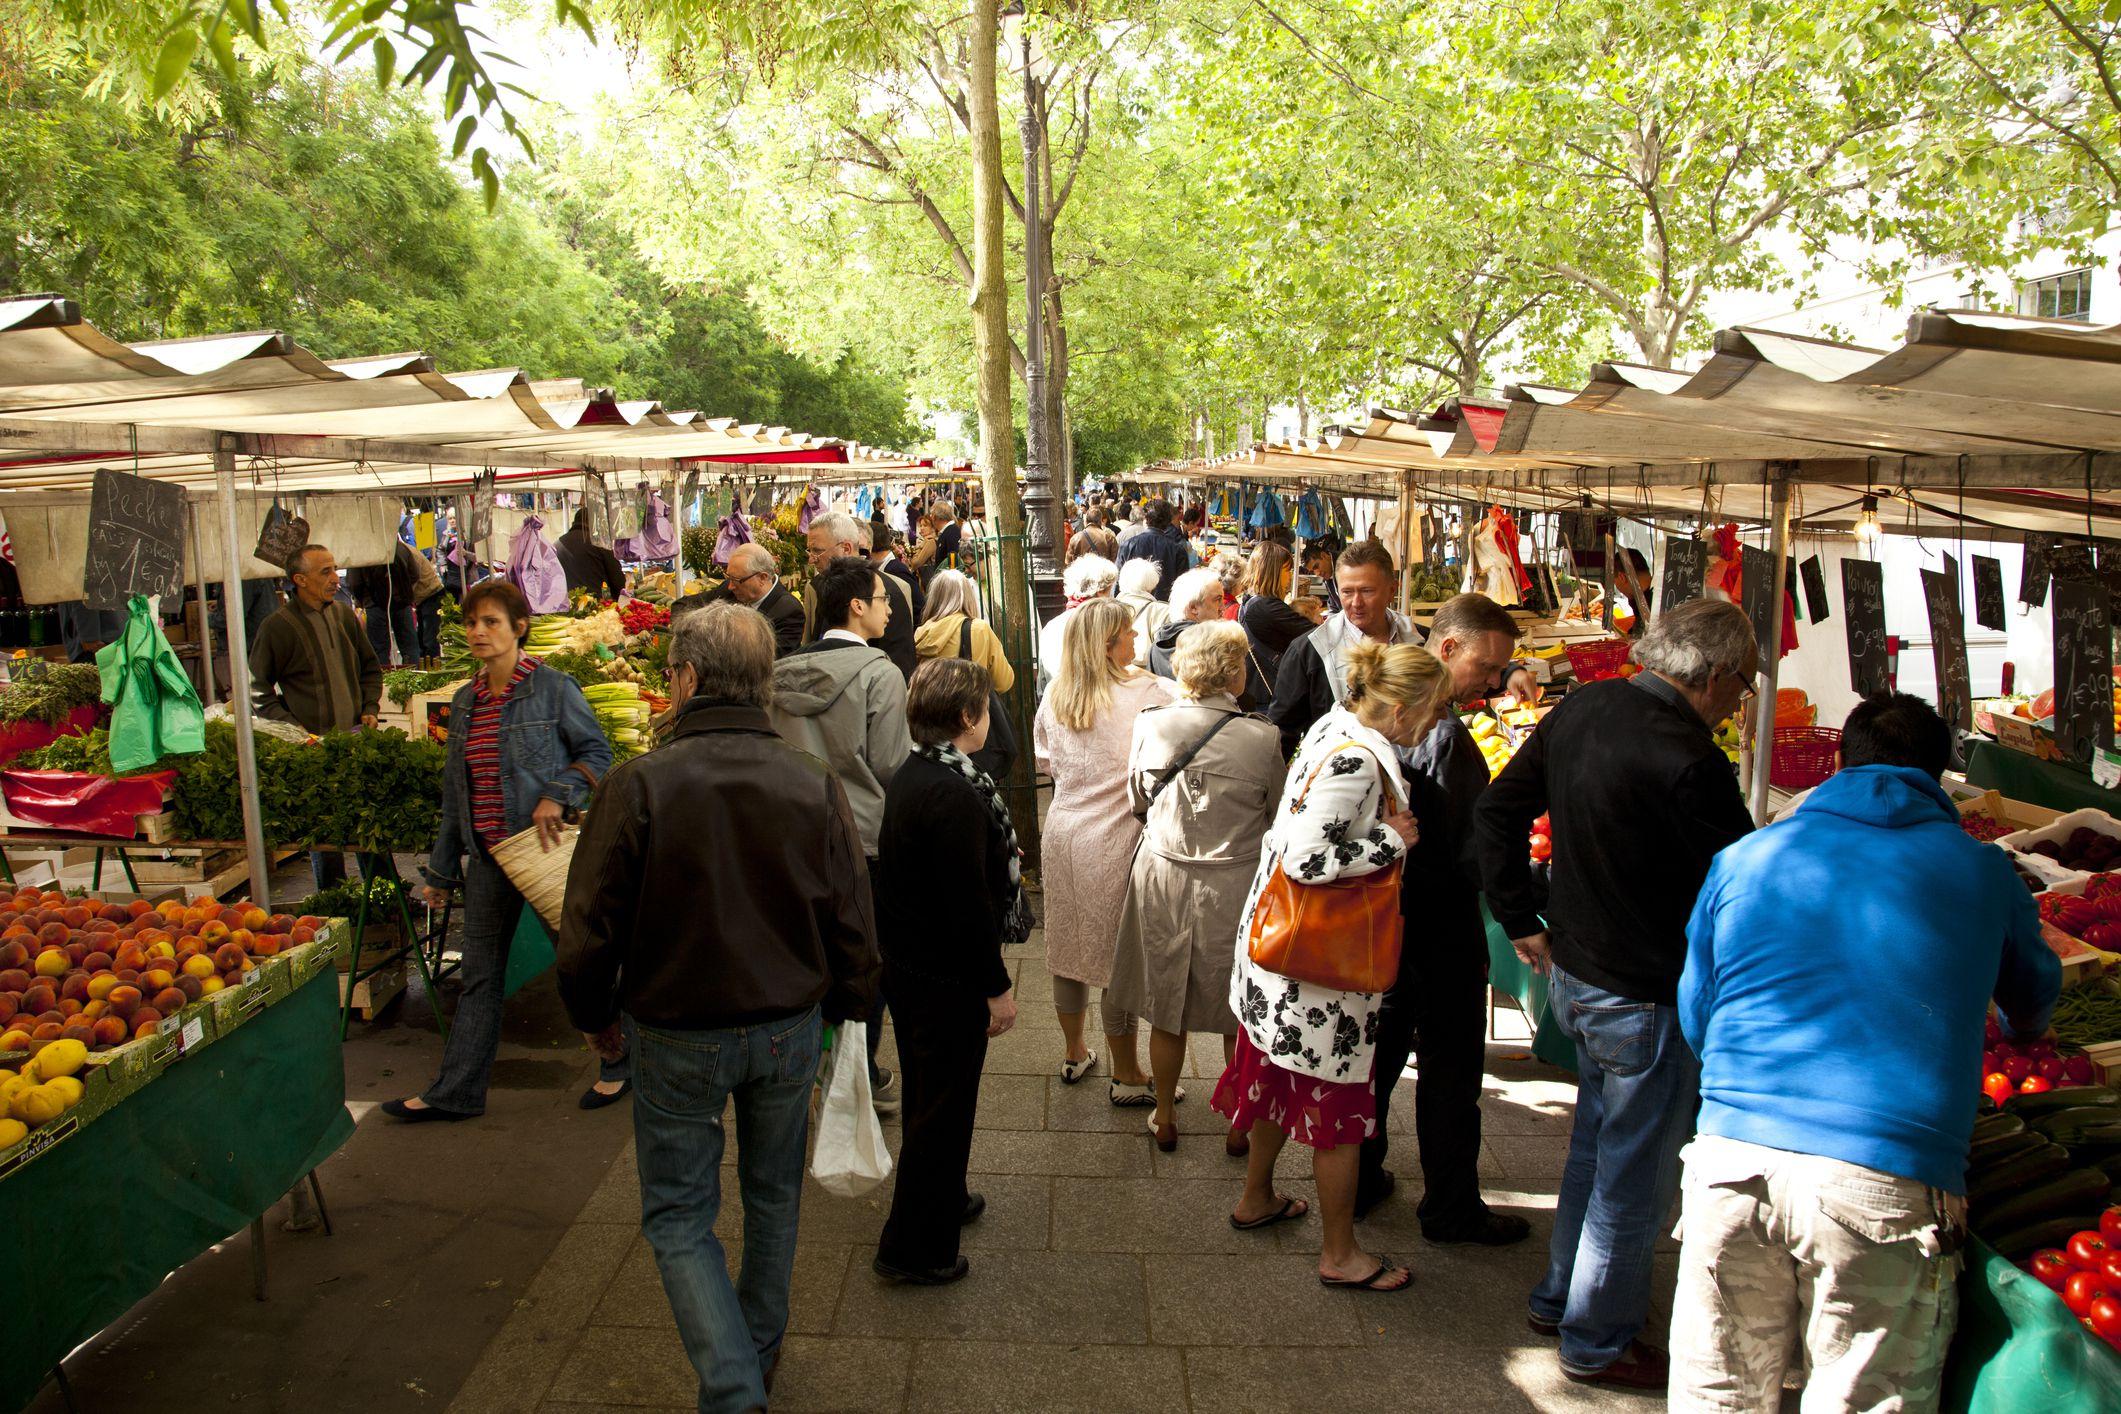 Sunday morning market in Place de la Bastille.